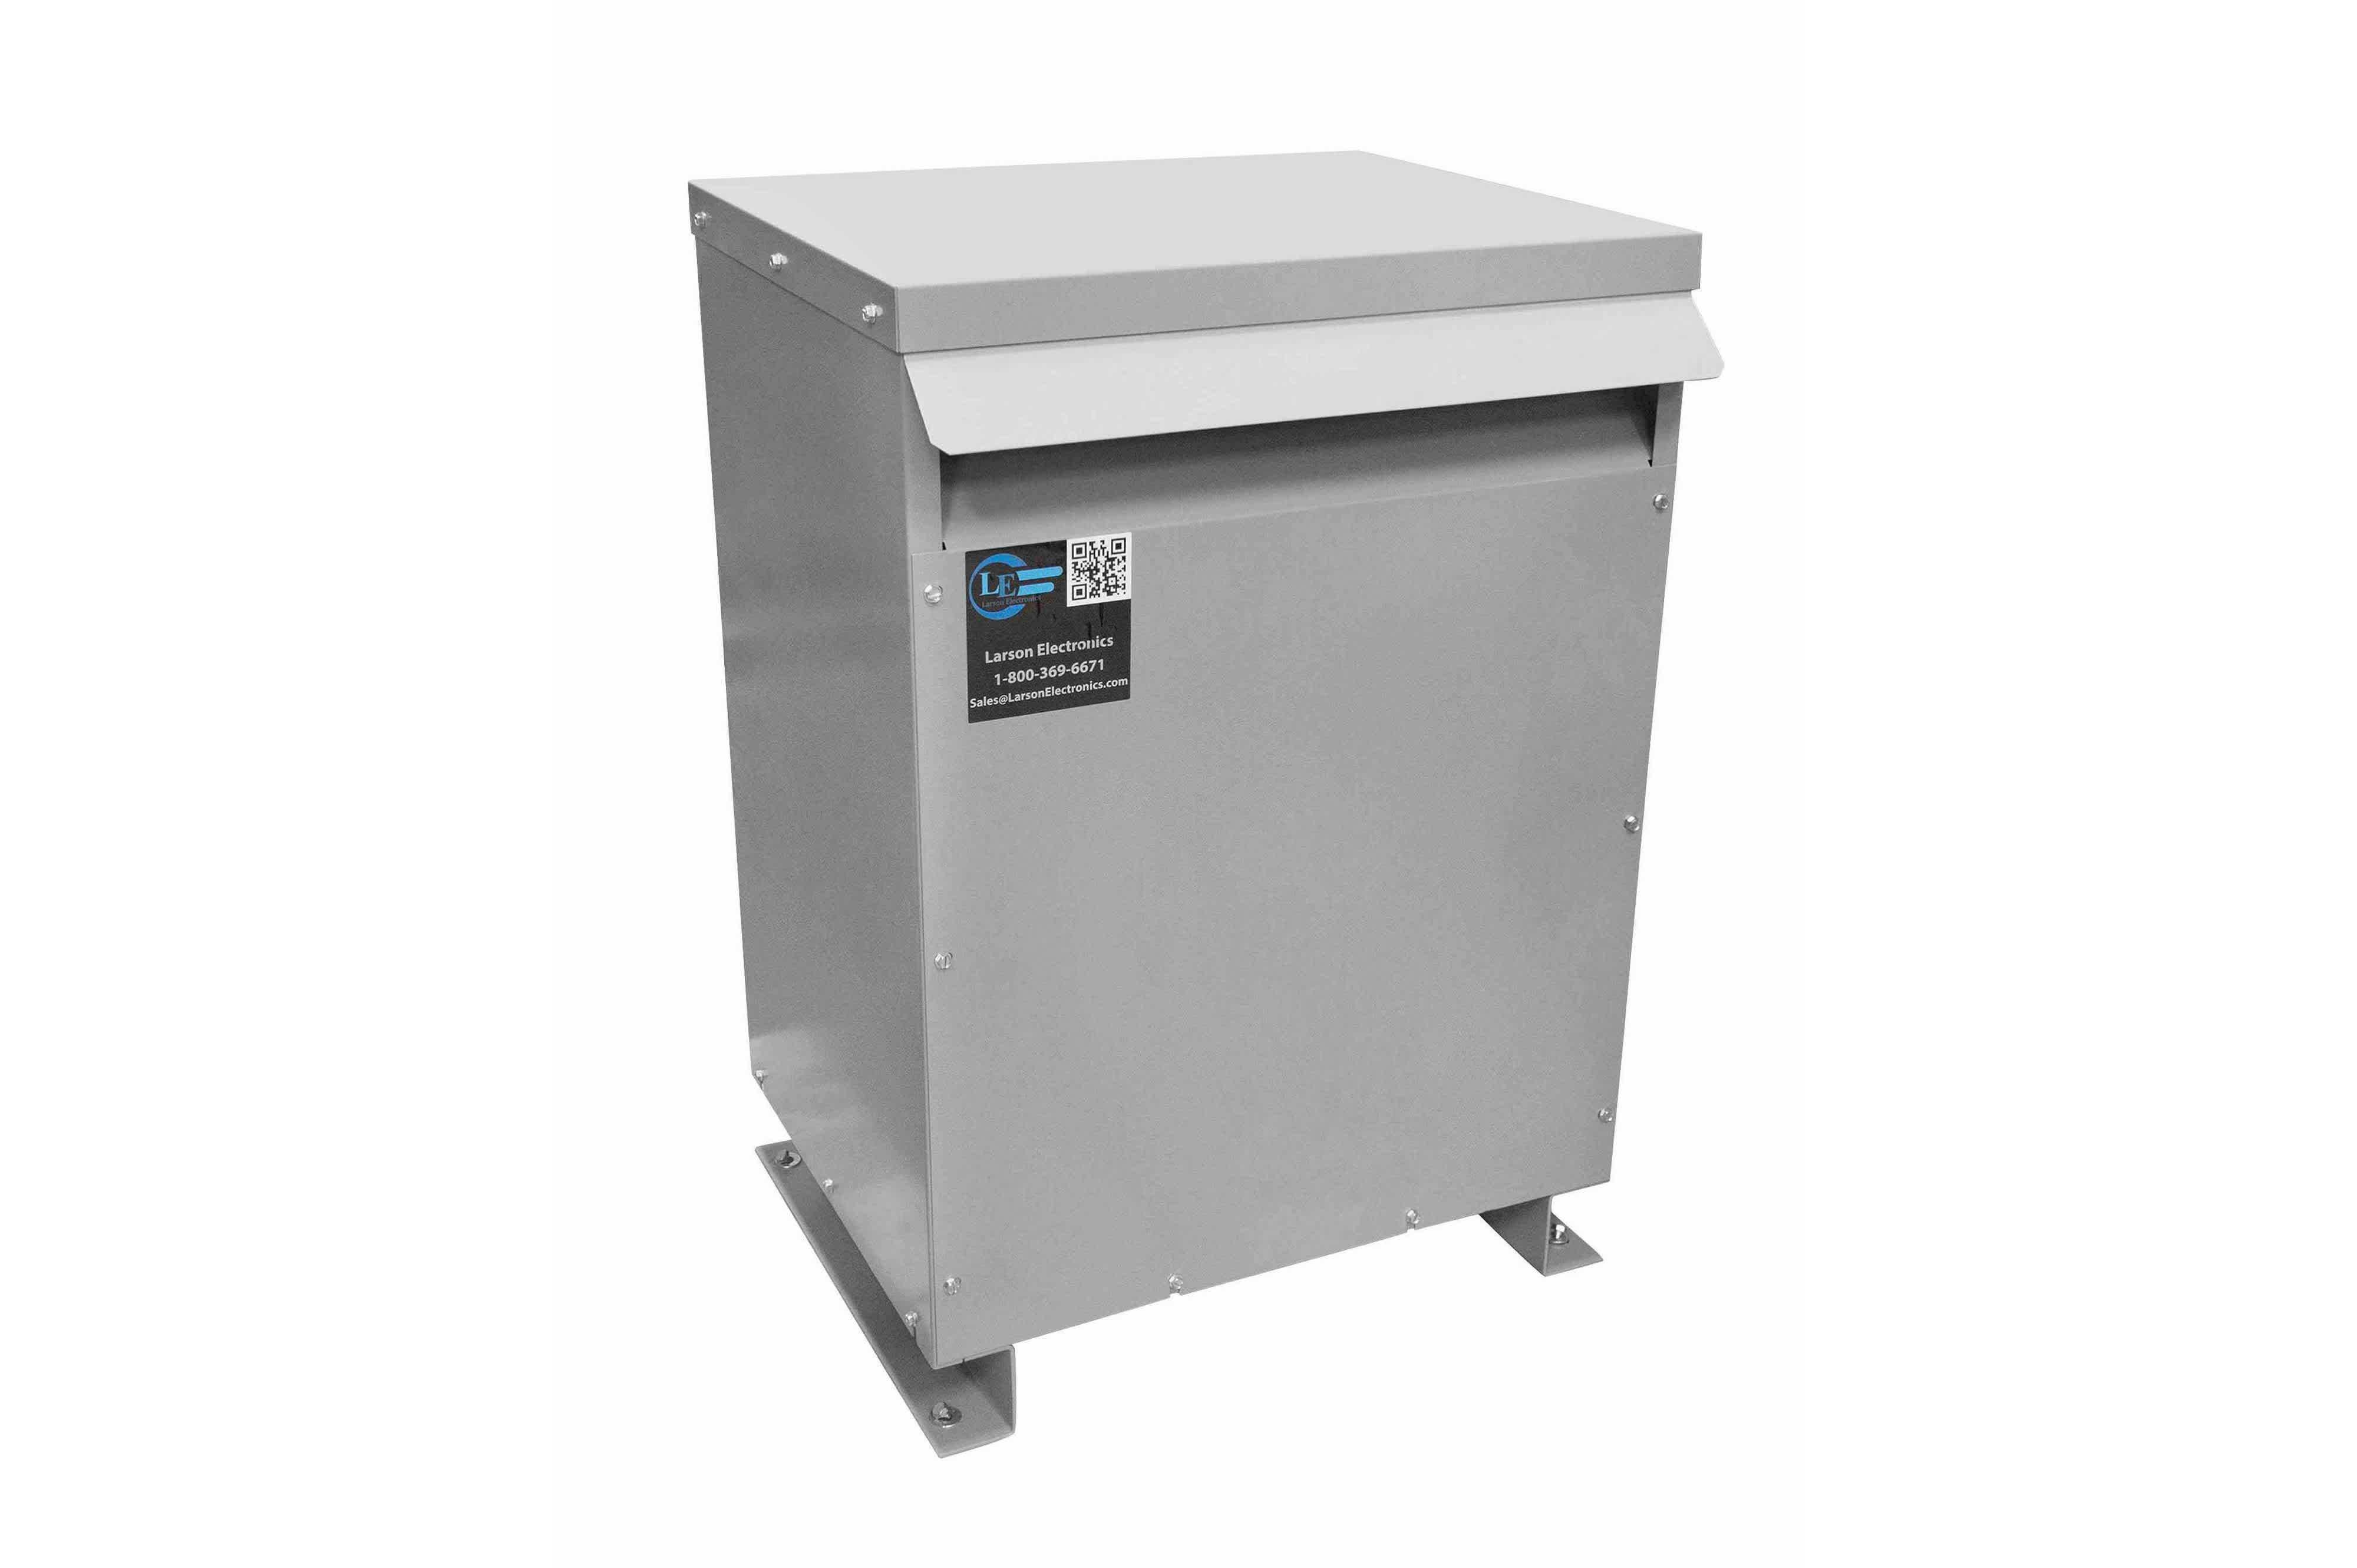 175 kVA 3PH Isolation Transformer, 480V Wye Primary, 600V Delta Secondary, N3R, Ventilated, 60 Hz